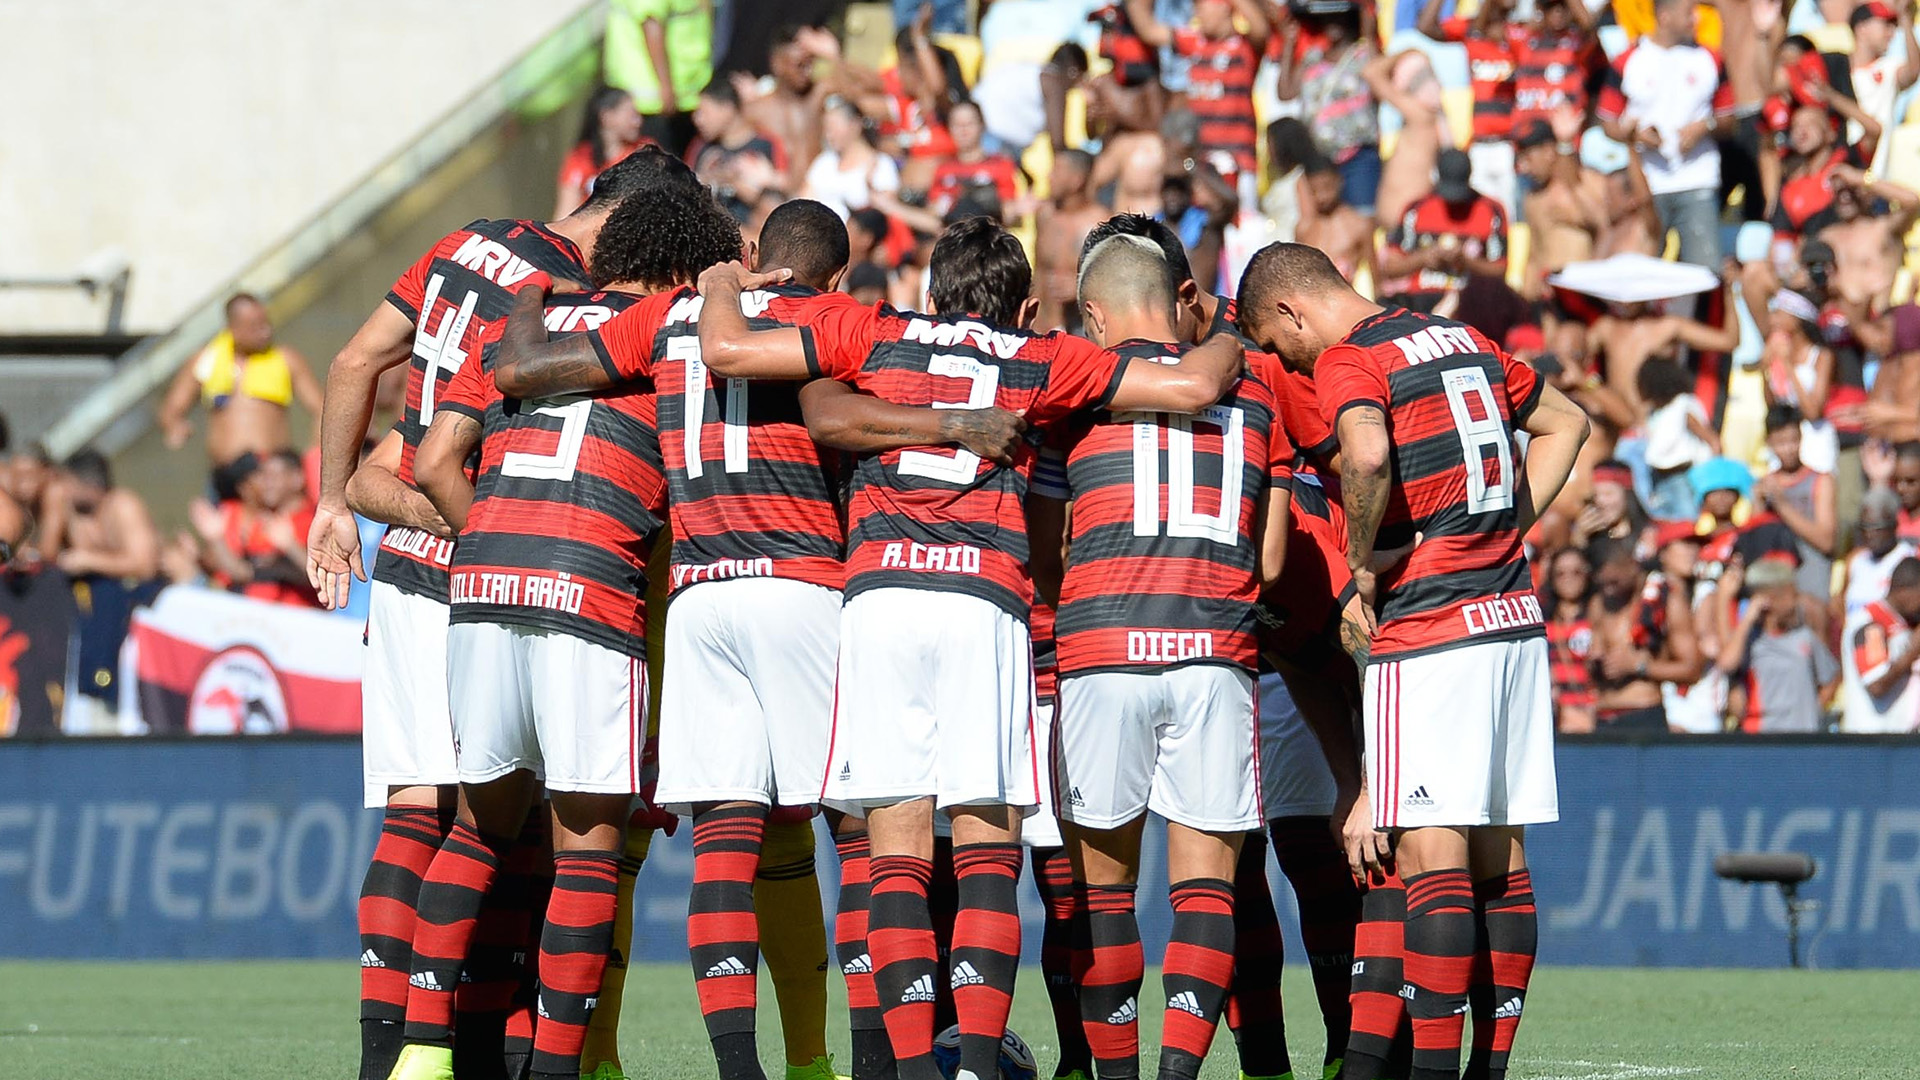 Flamengo 20012019